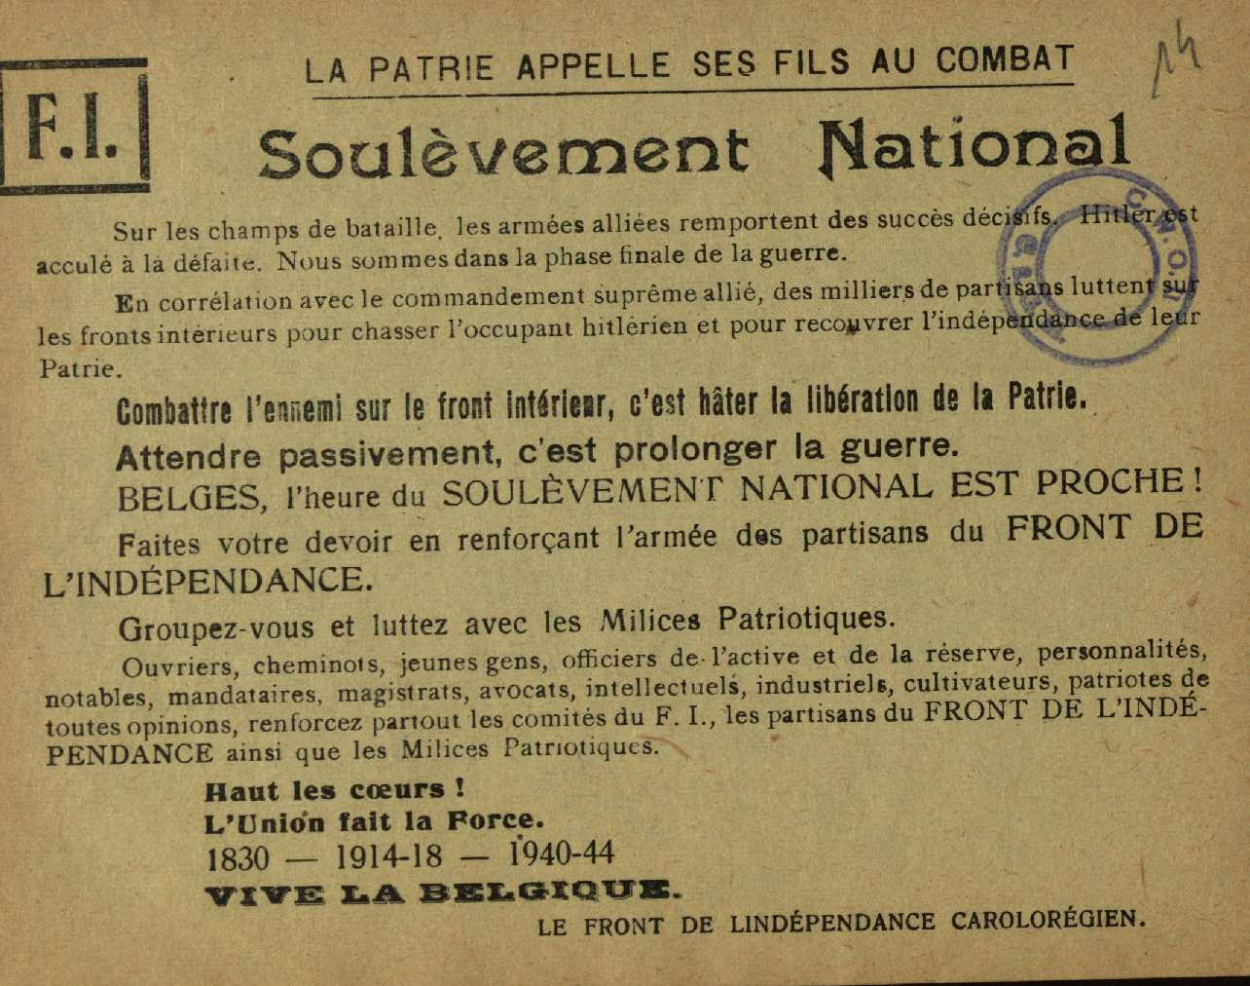 ii8-fi-appel-au-soulAvement-national.jpg